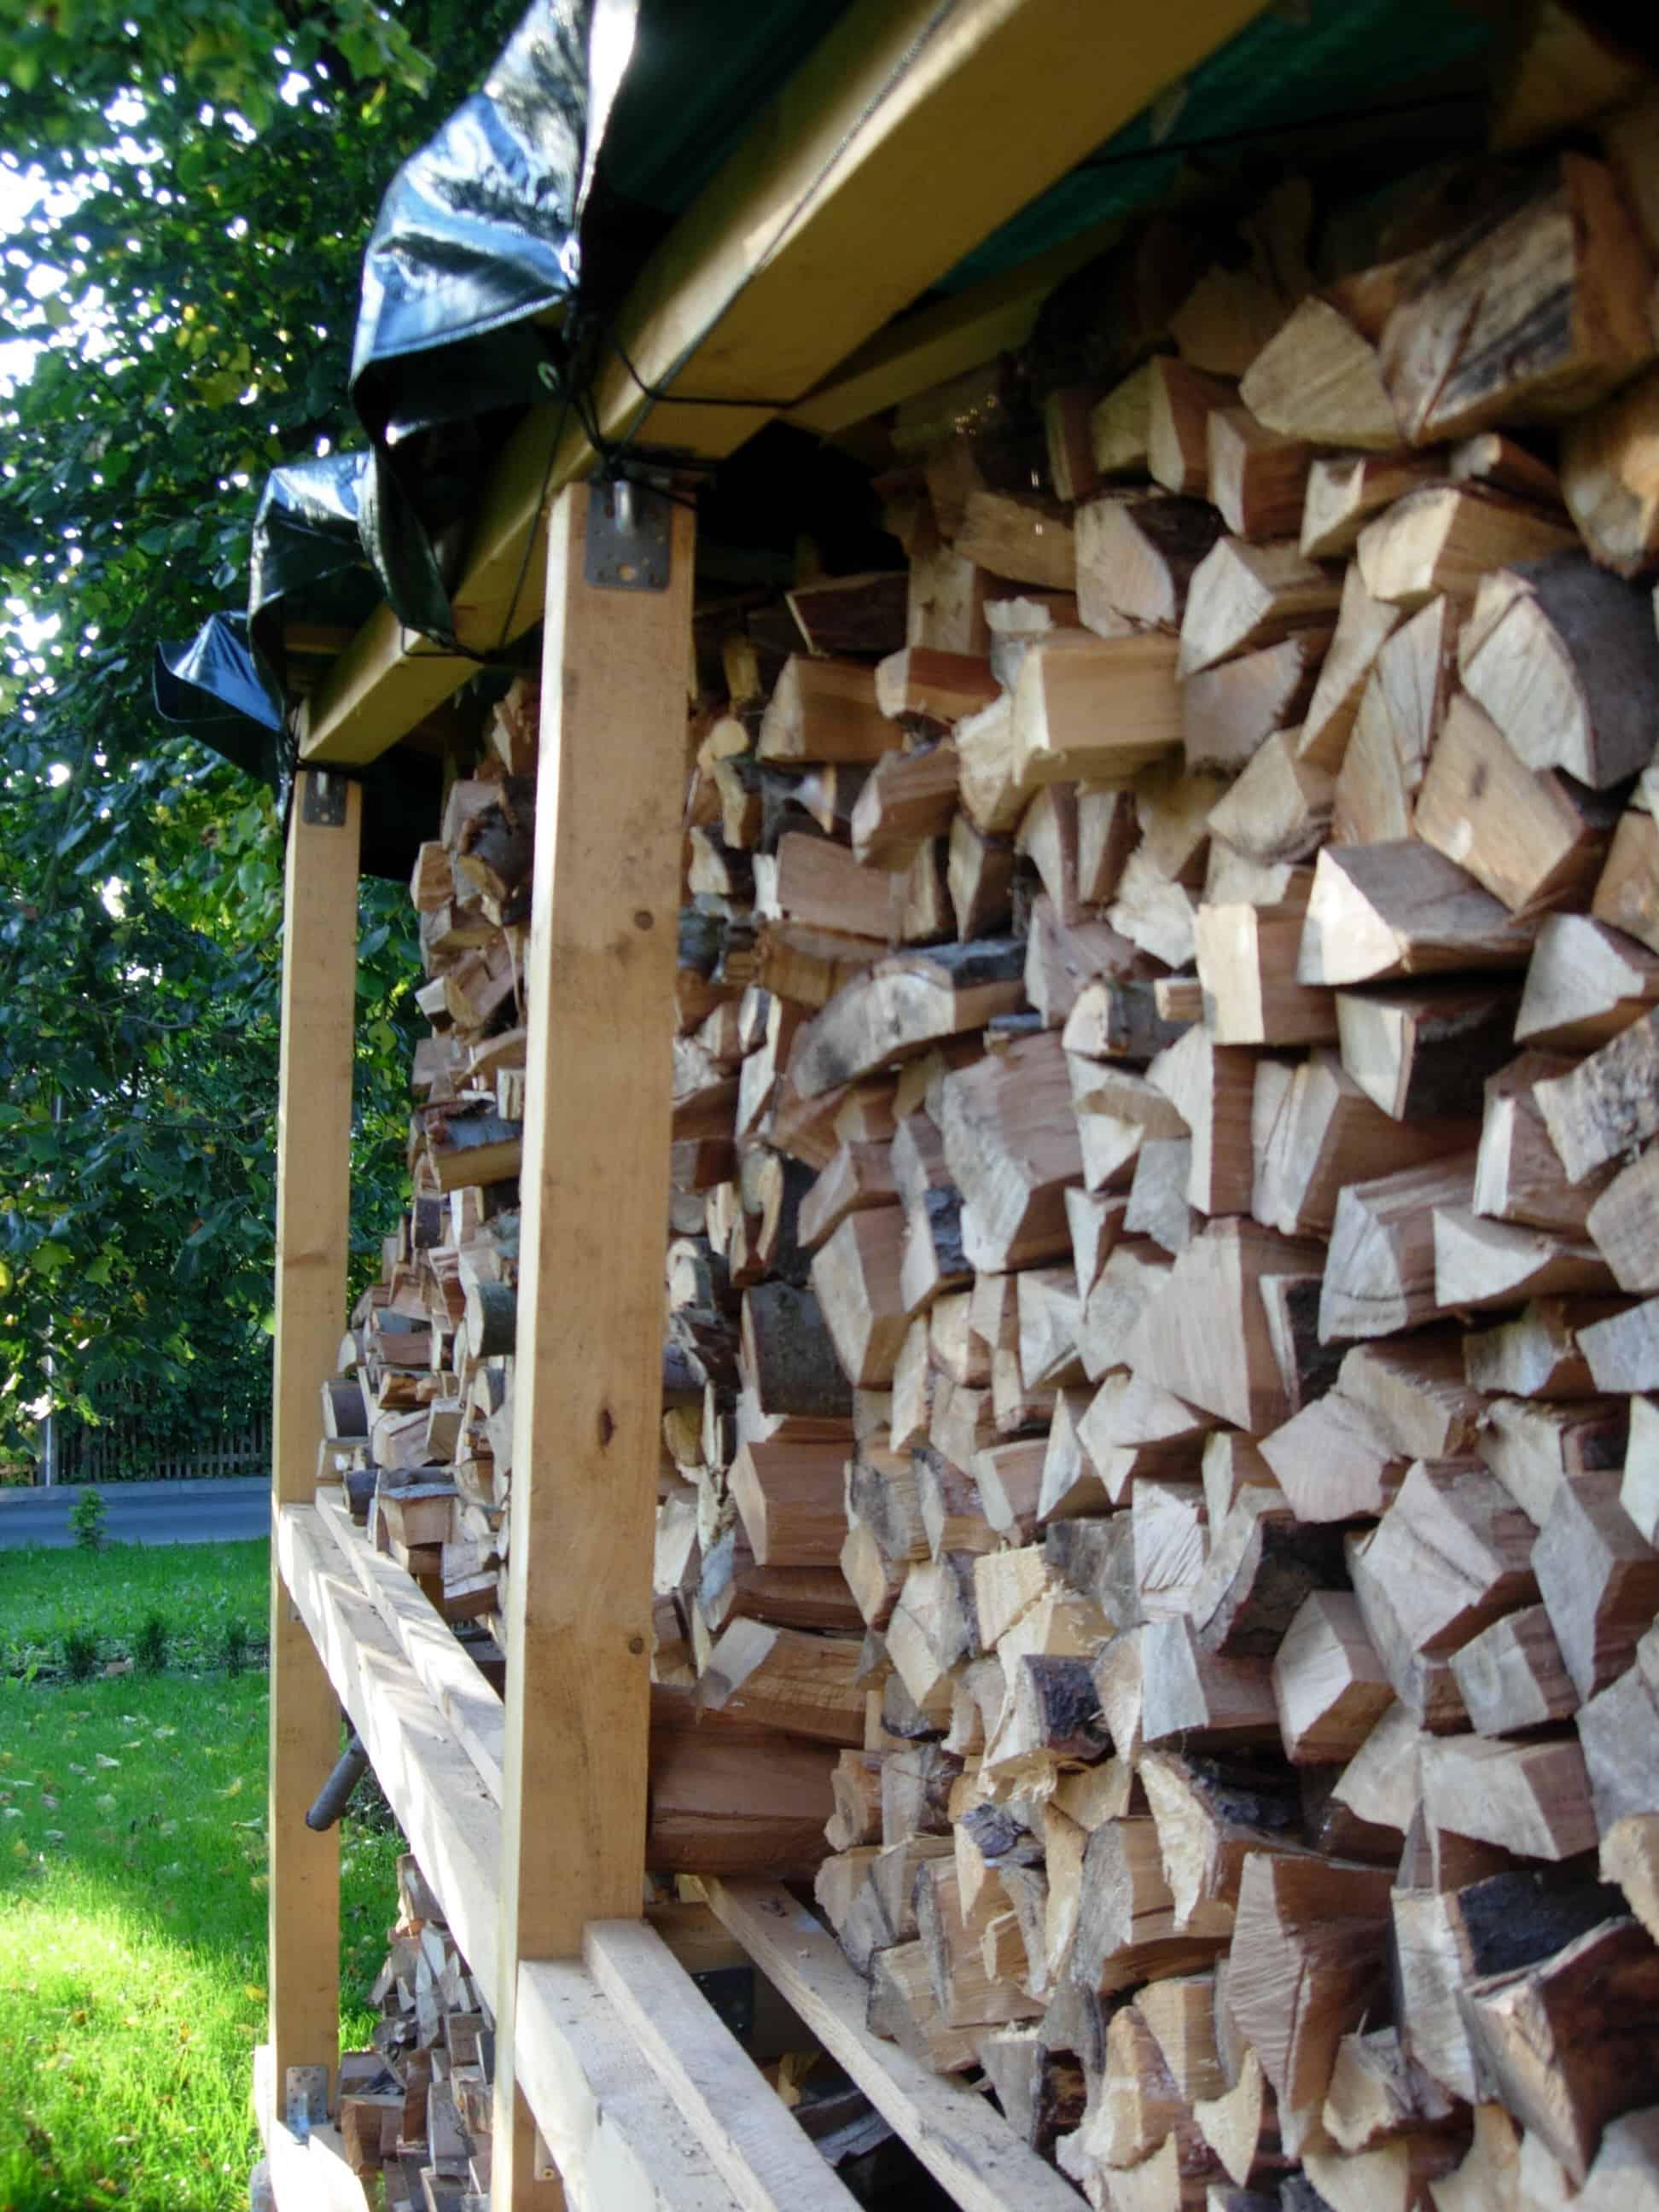 Bau des Brennholz-Lagerregales im Garten